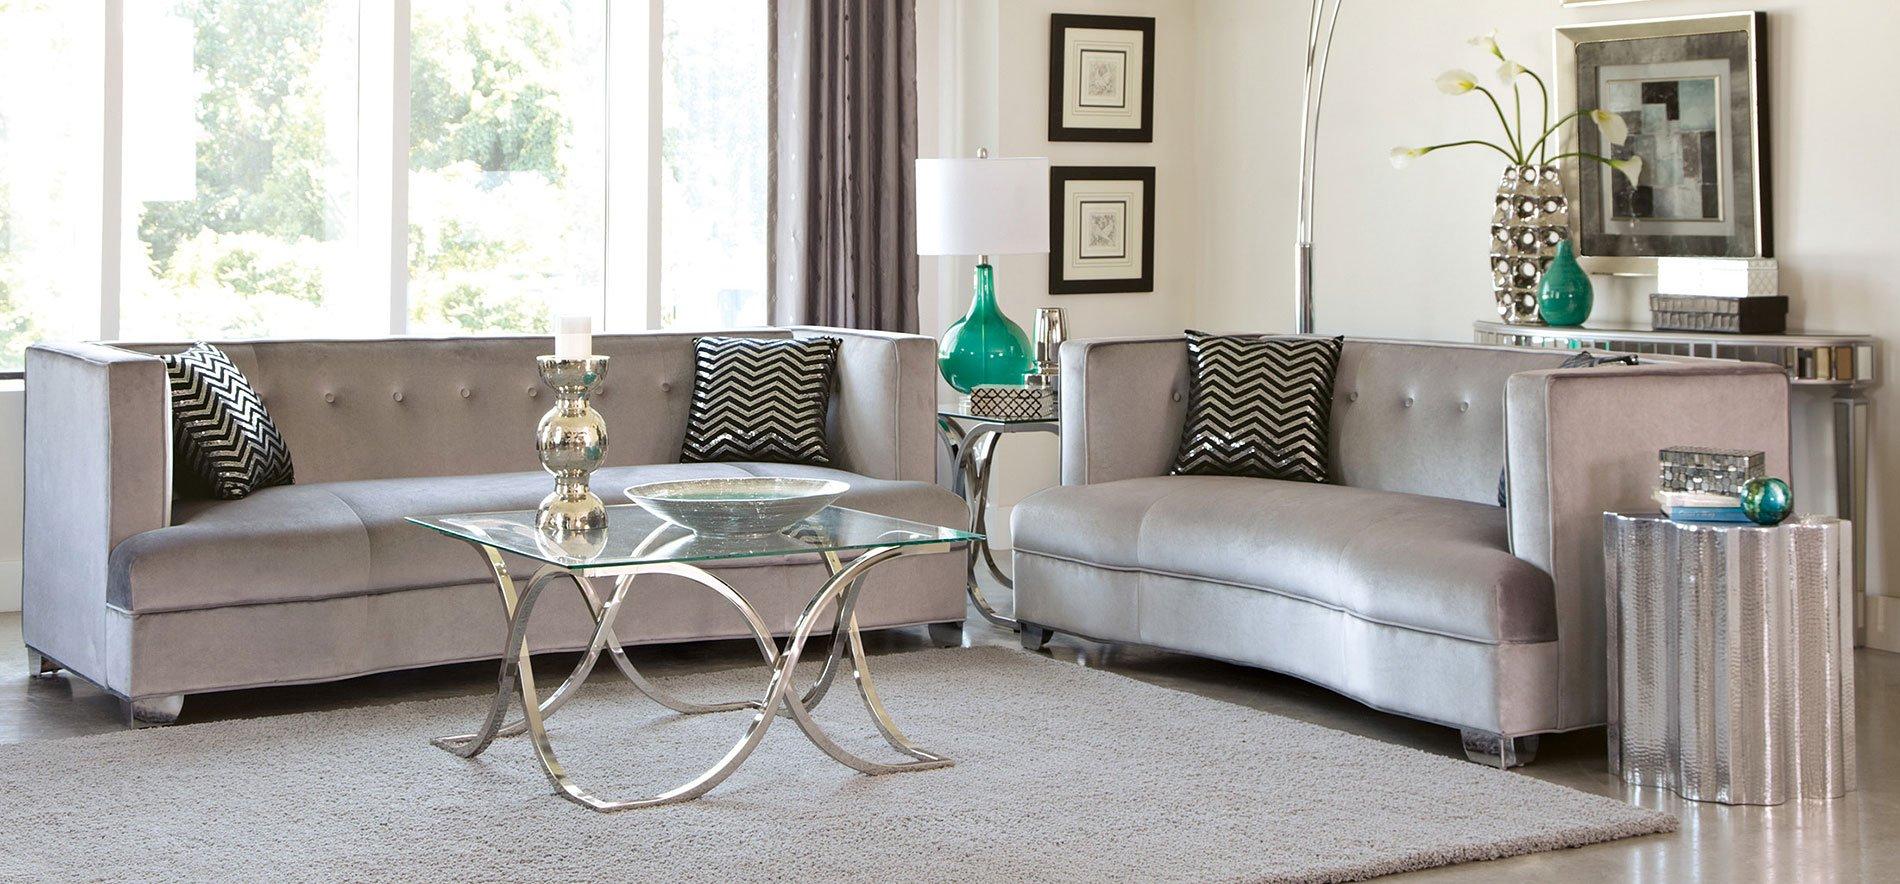 Caldwell living room set by coaster furniture 1 reviews furniturepick